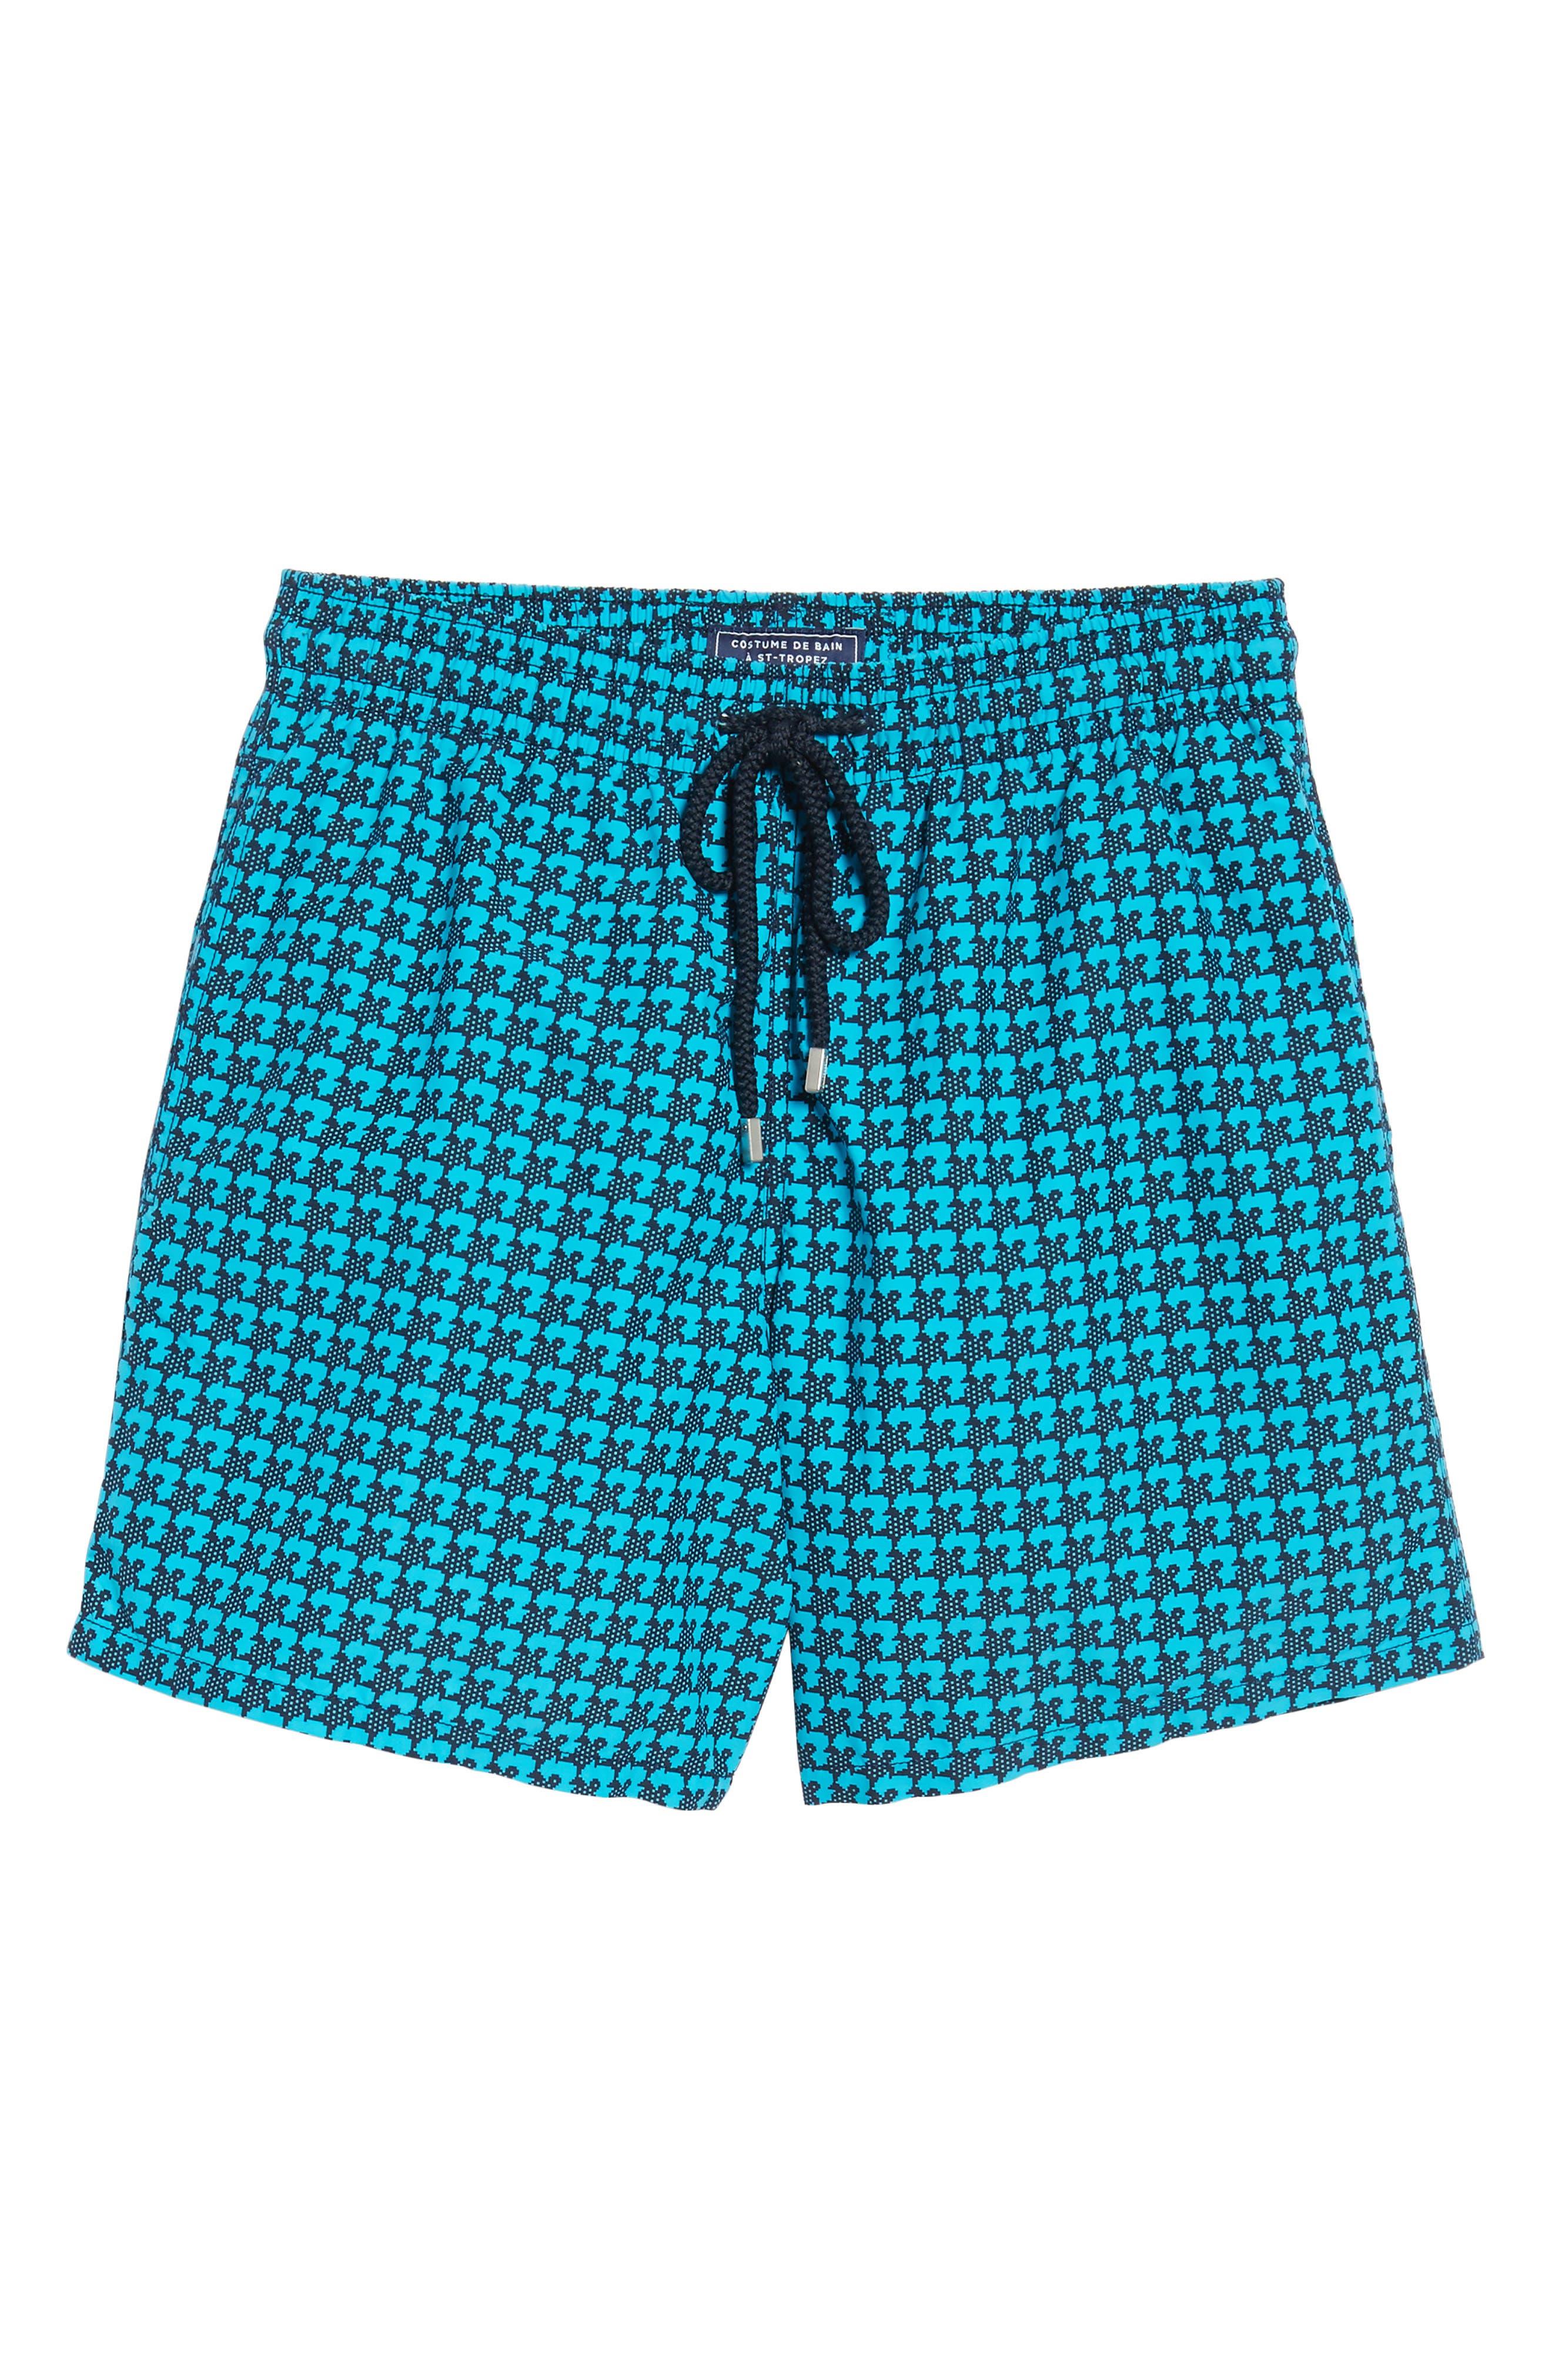 Moorea Baby Trop Swim Shorts,                             Alternate thumbnail 6, color,                             Azure